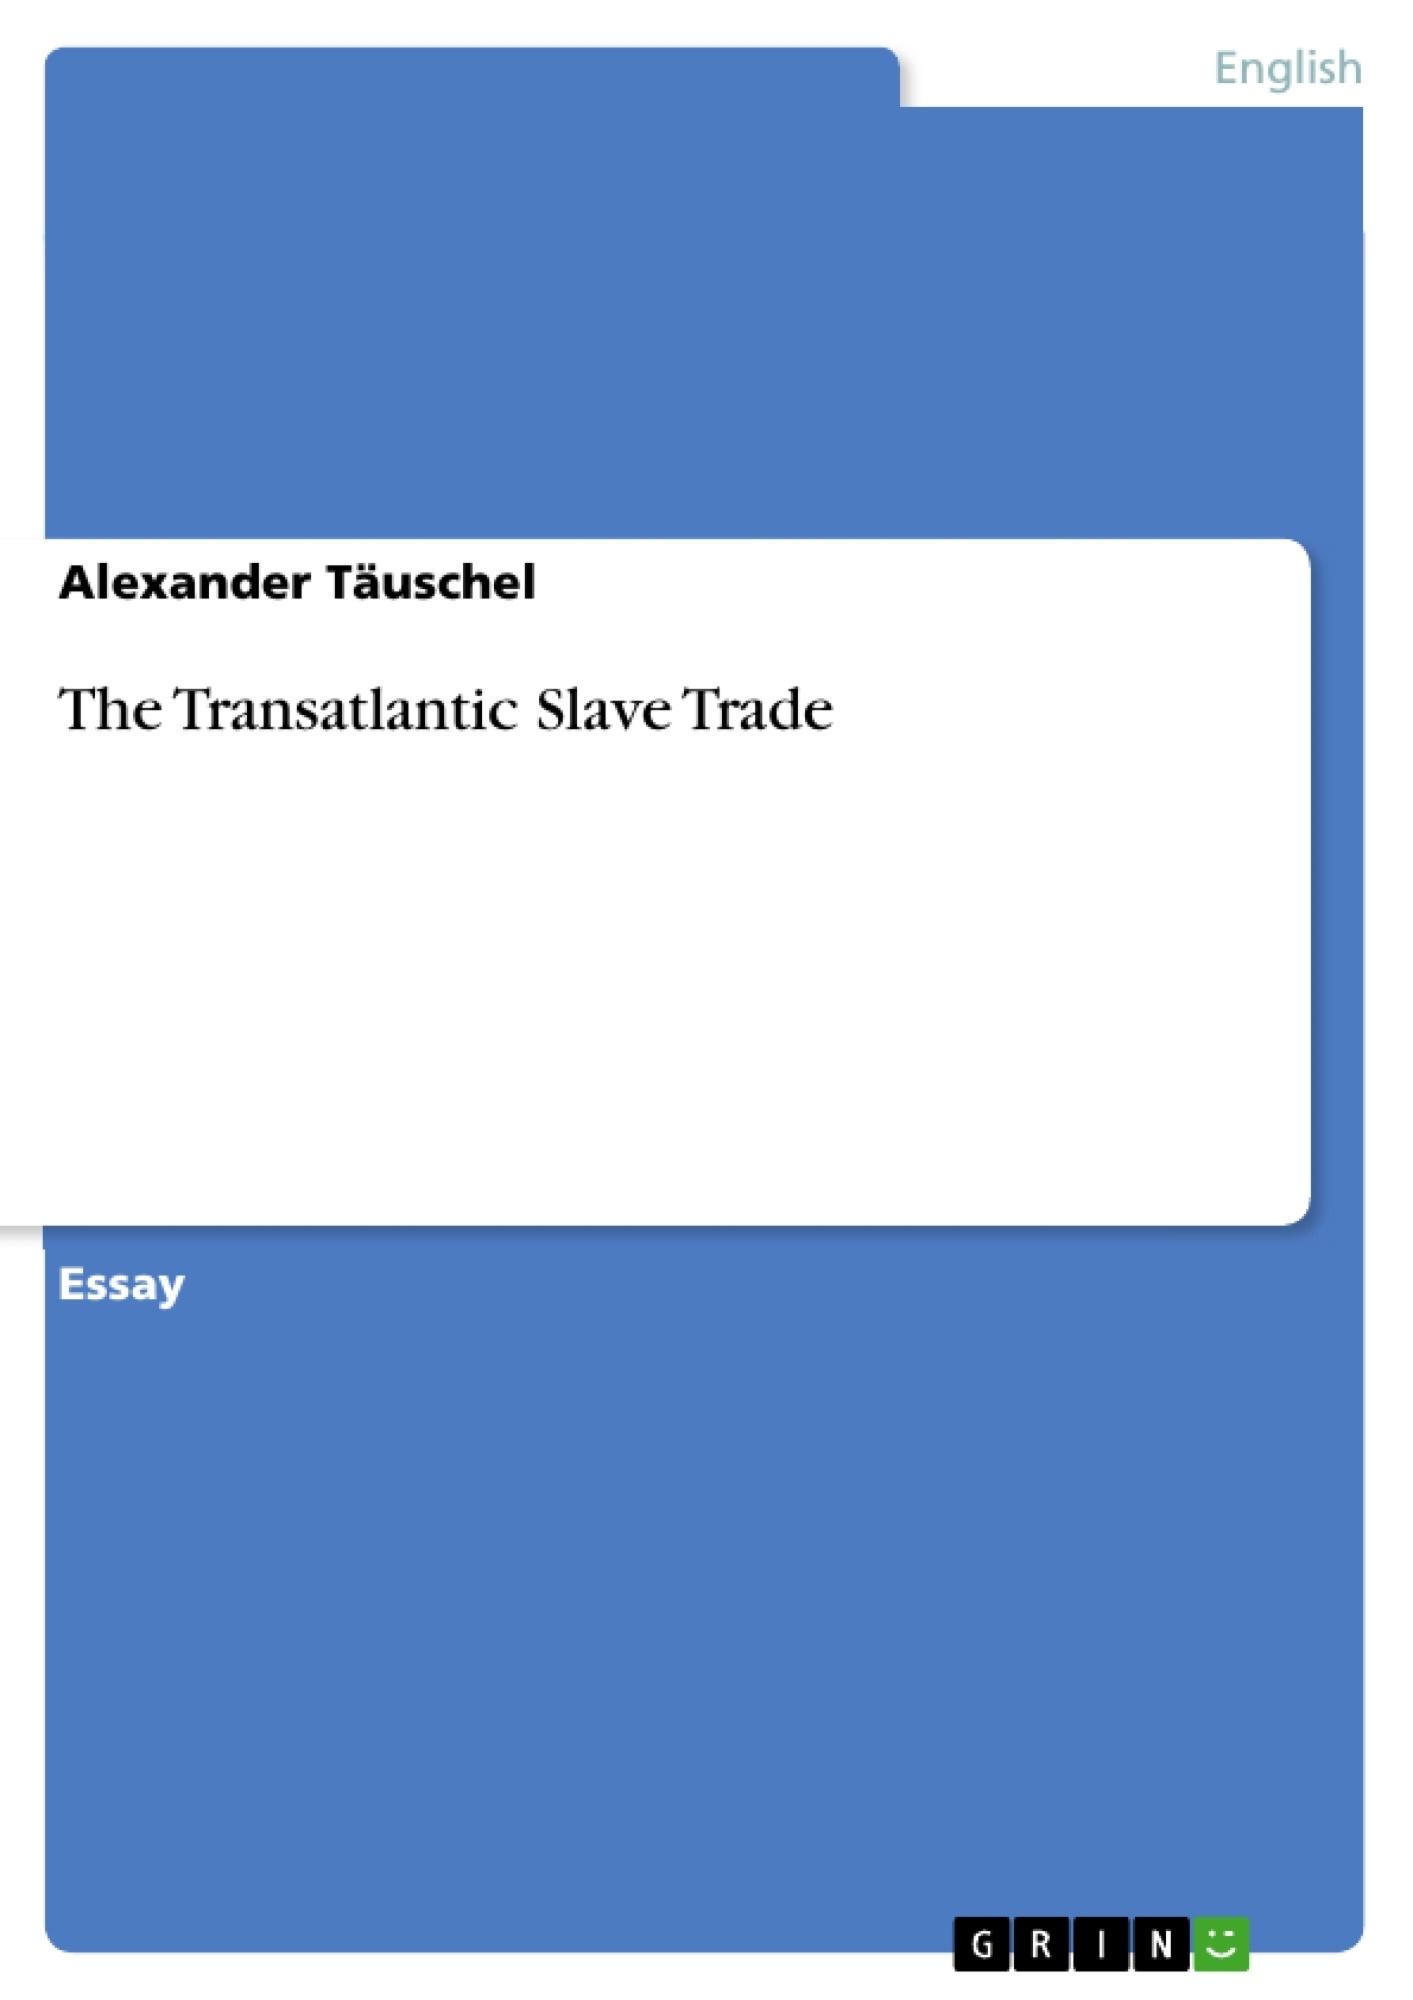 Title: The Transatlantic Slave Trade